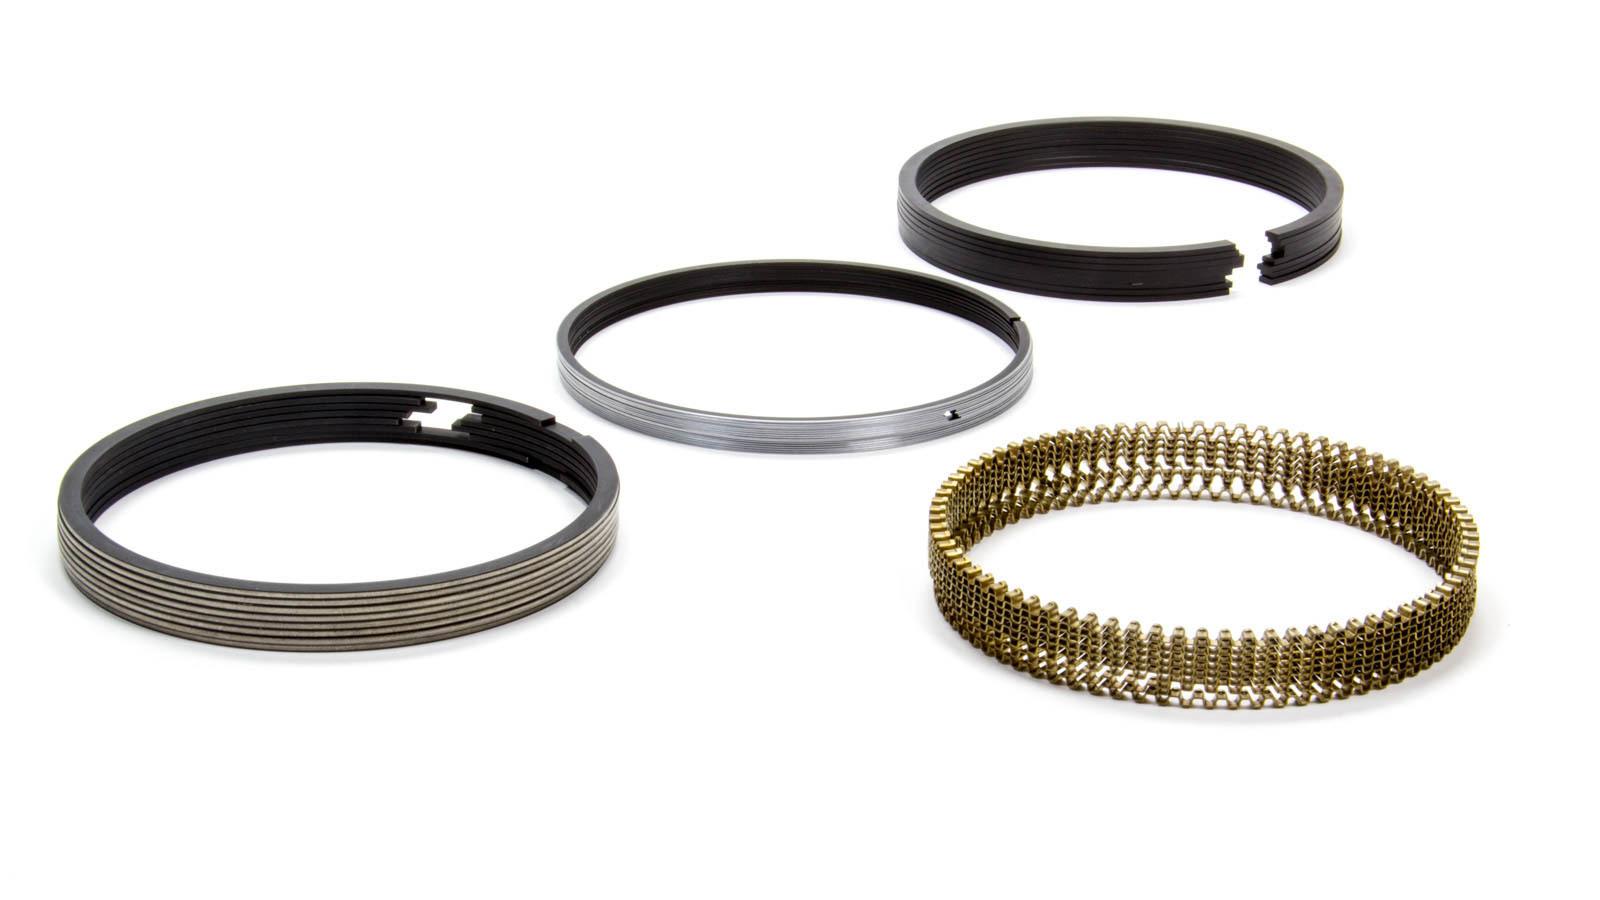 Piston Ring Set 4.005 Classic 1.5 1.5 3.0mm